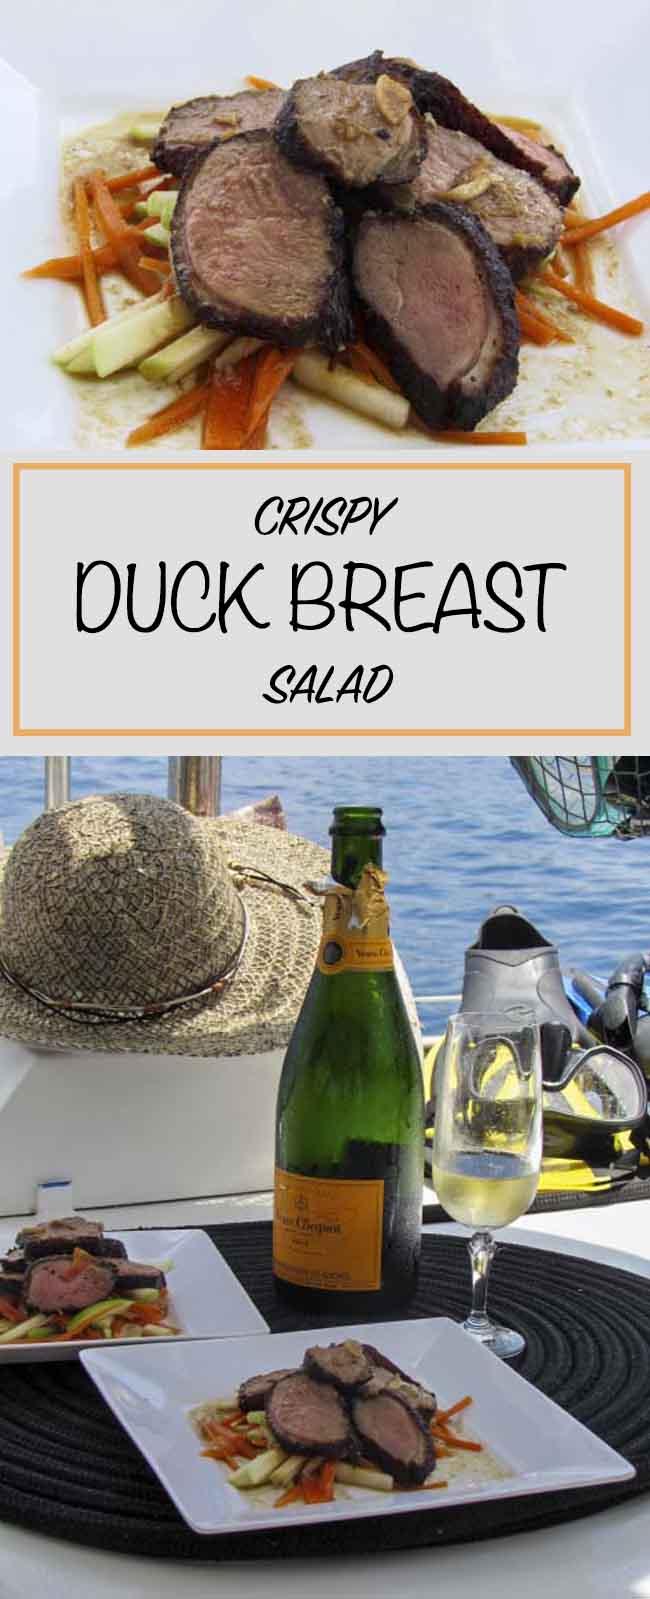 Crispy Duck Breast Salad